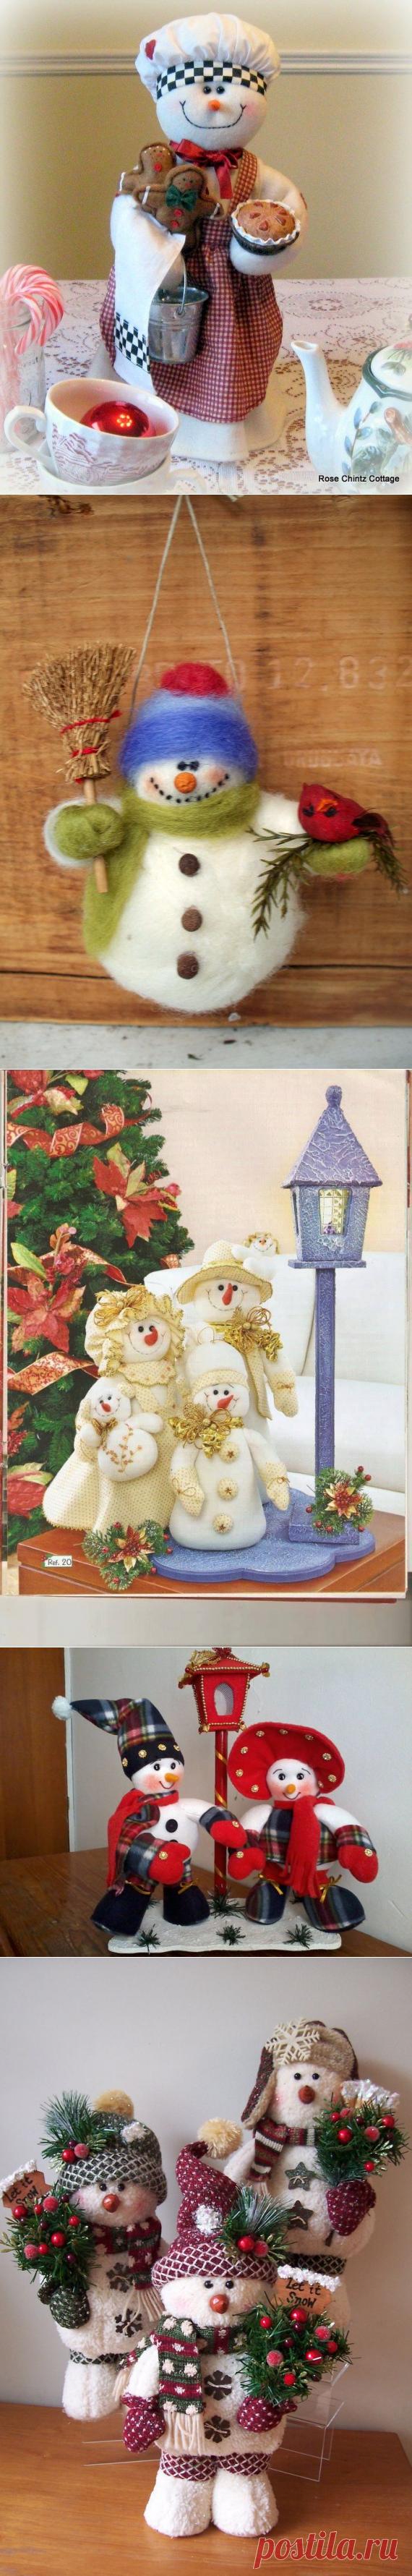 коллекция новогодних снеговиков